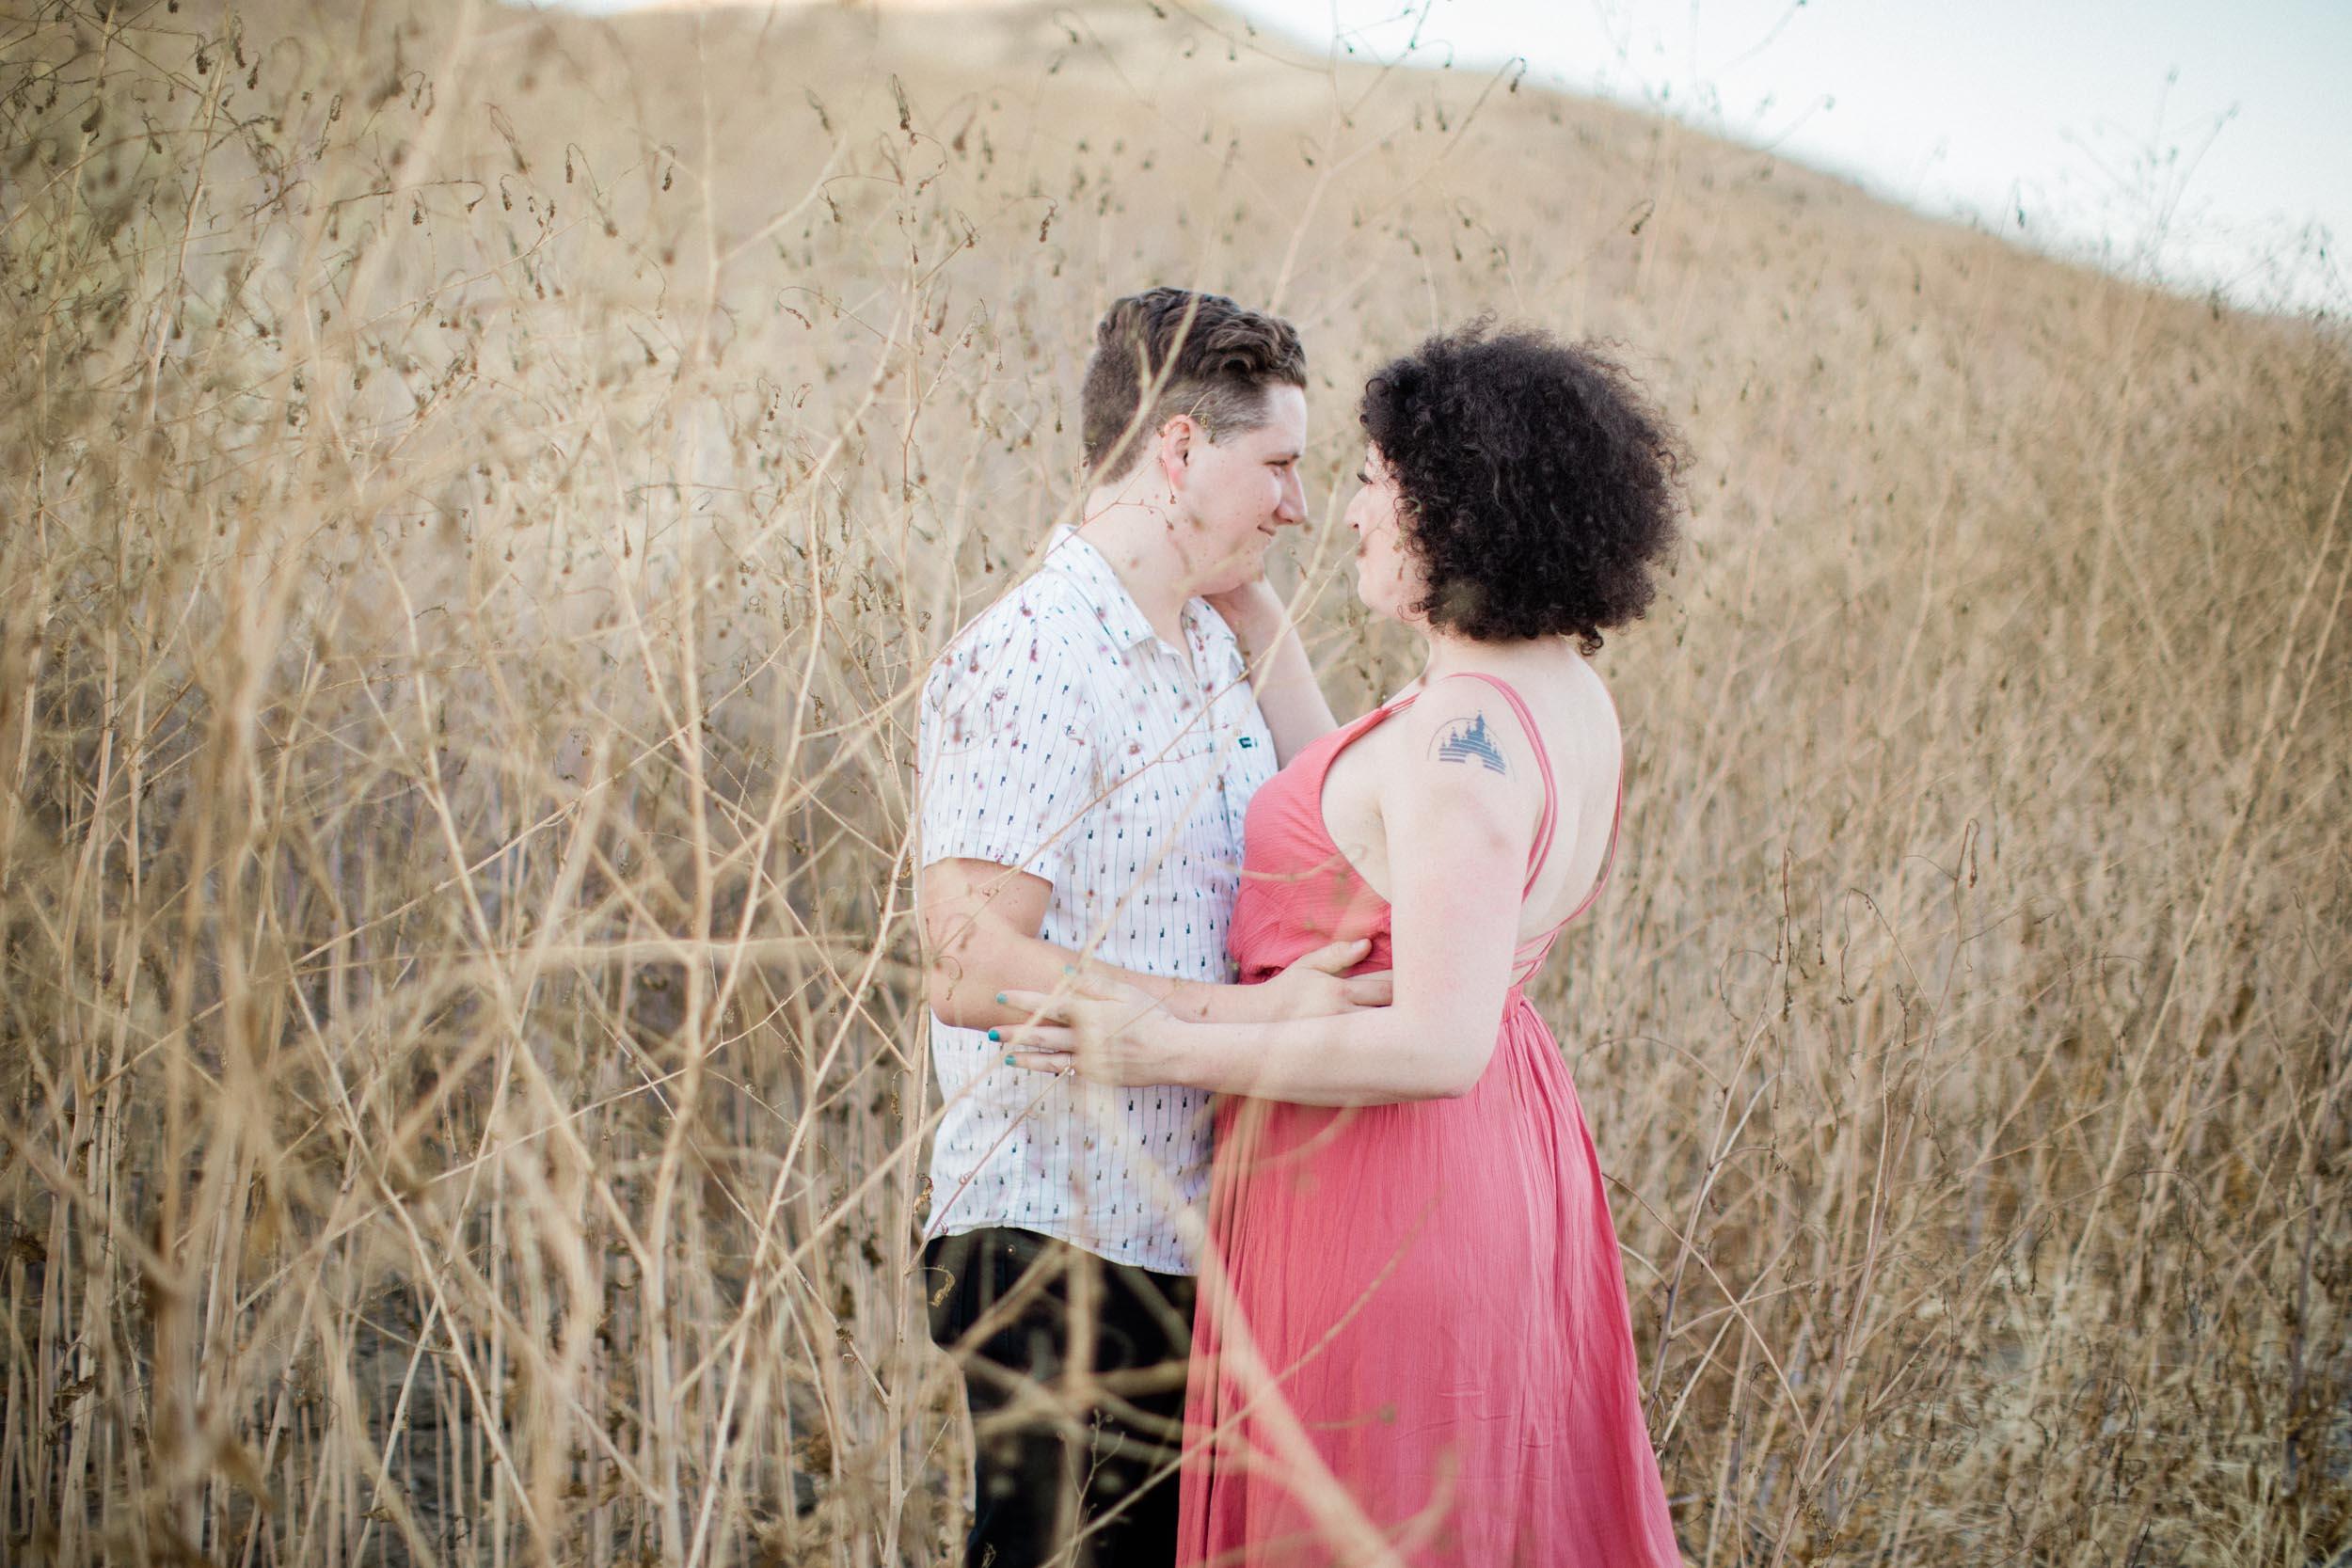 BKM-Photography-Ventura-Southern-California-Engagement-Wedding-0033.jpg